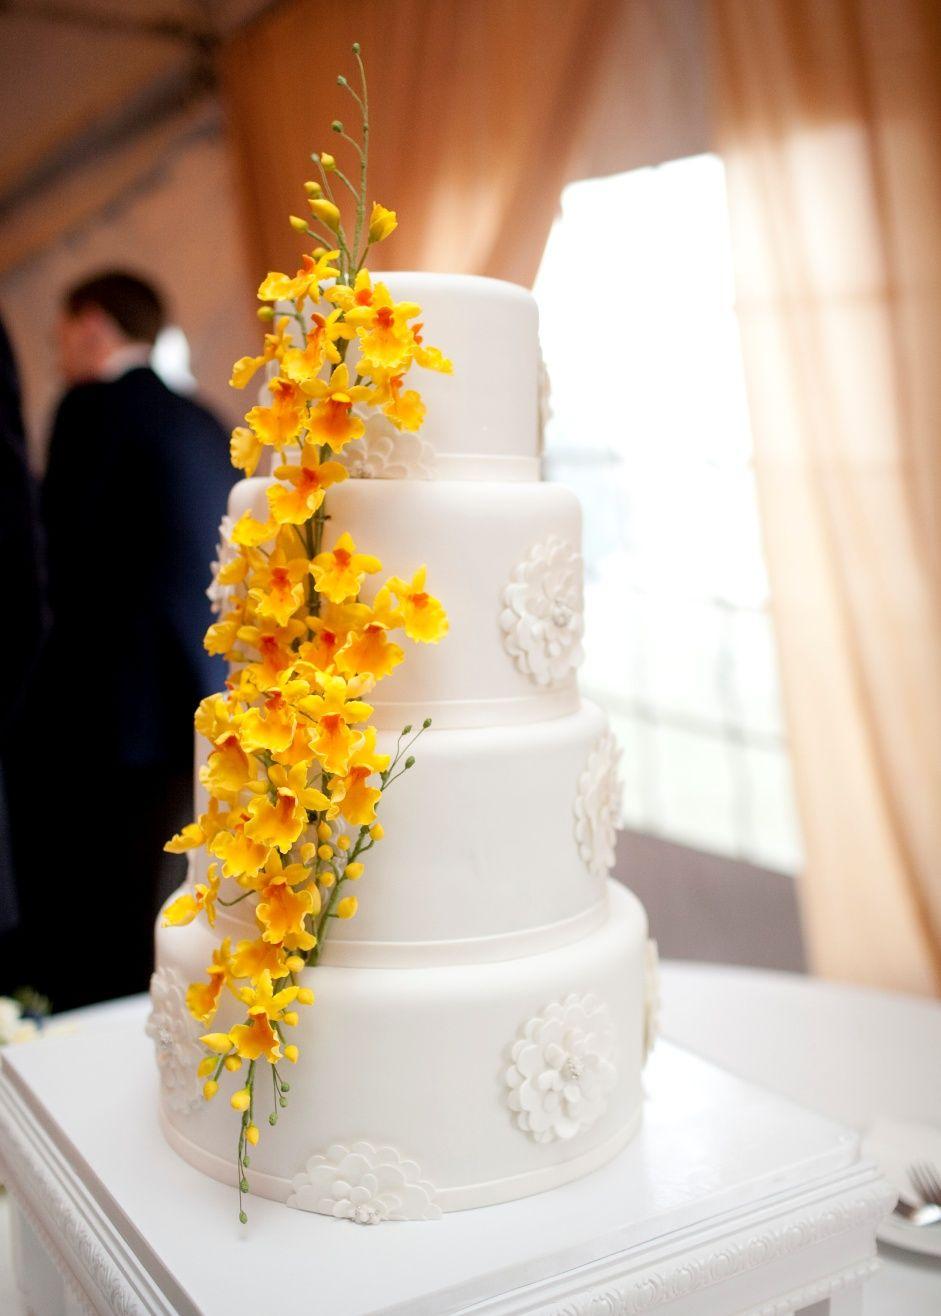 Sugar yellow oncidiums on a clean modern cake wedding cakes by